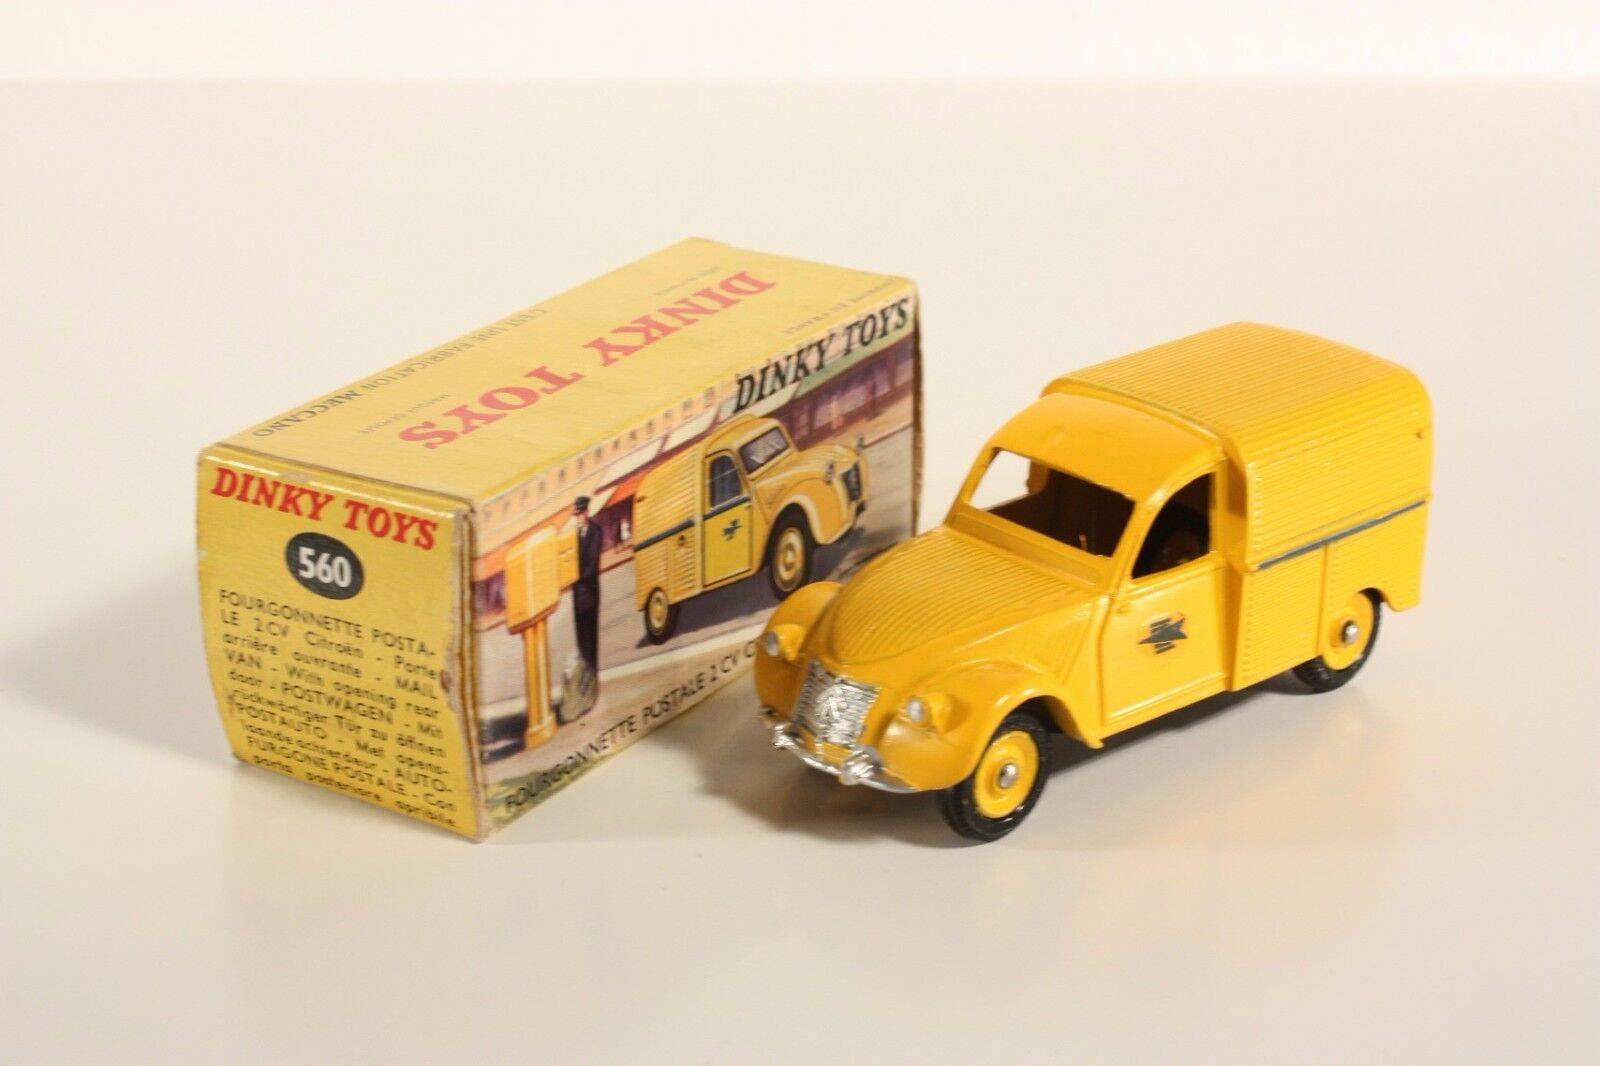 DINKY TOYS 560, fourgonnette postale 2 CV Citroën, Comme neuf in box  ab2054